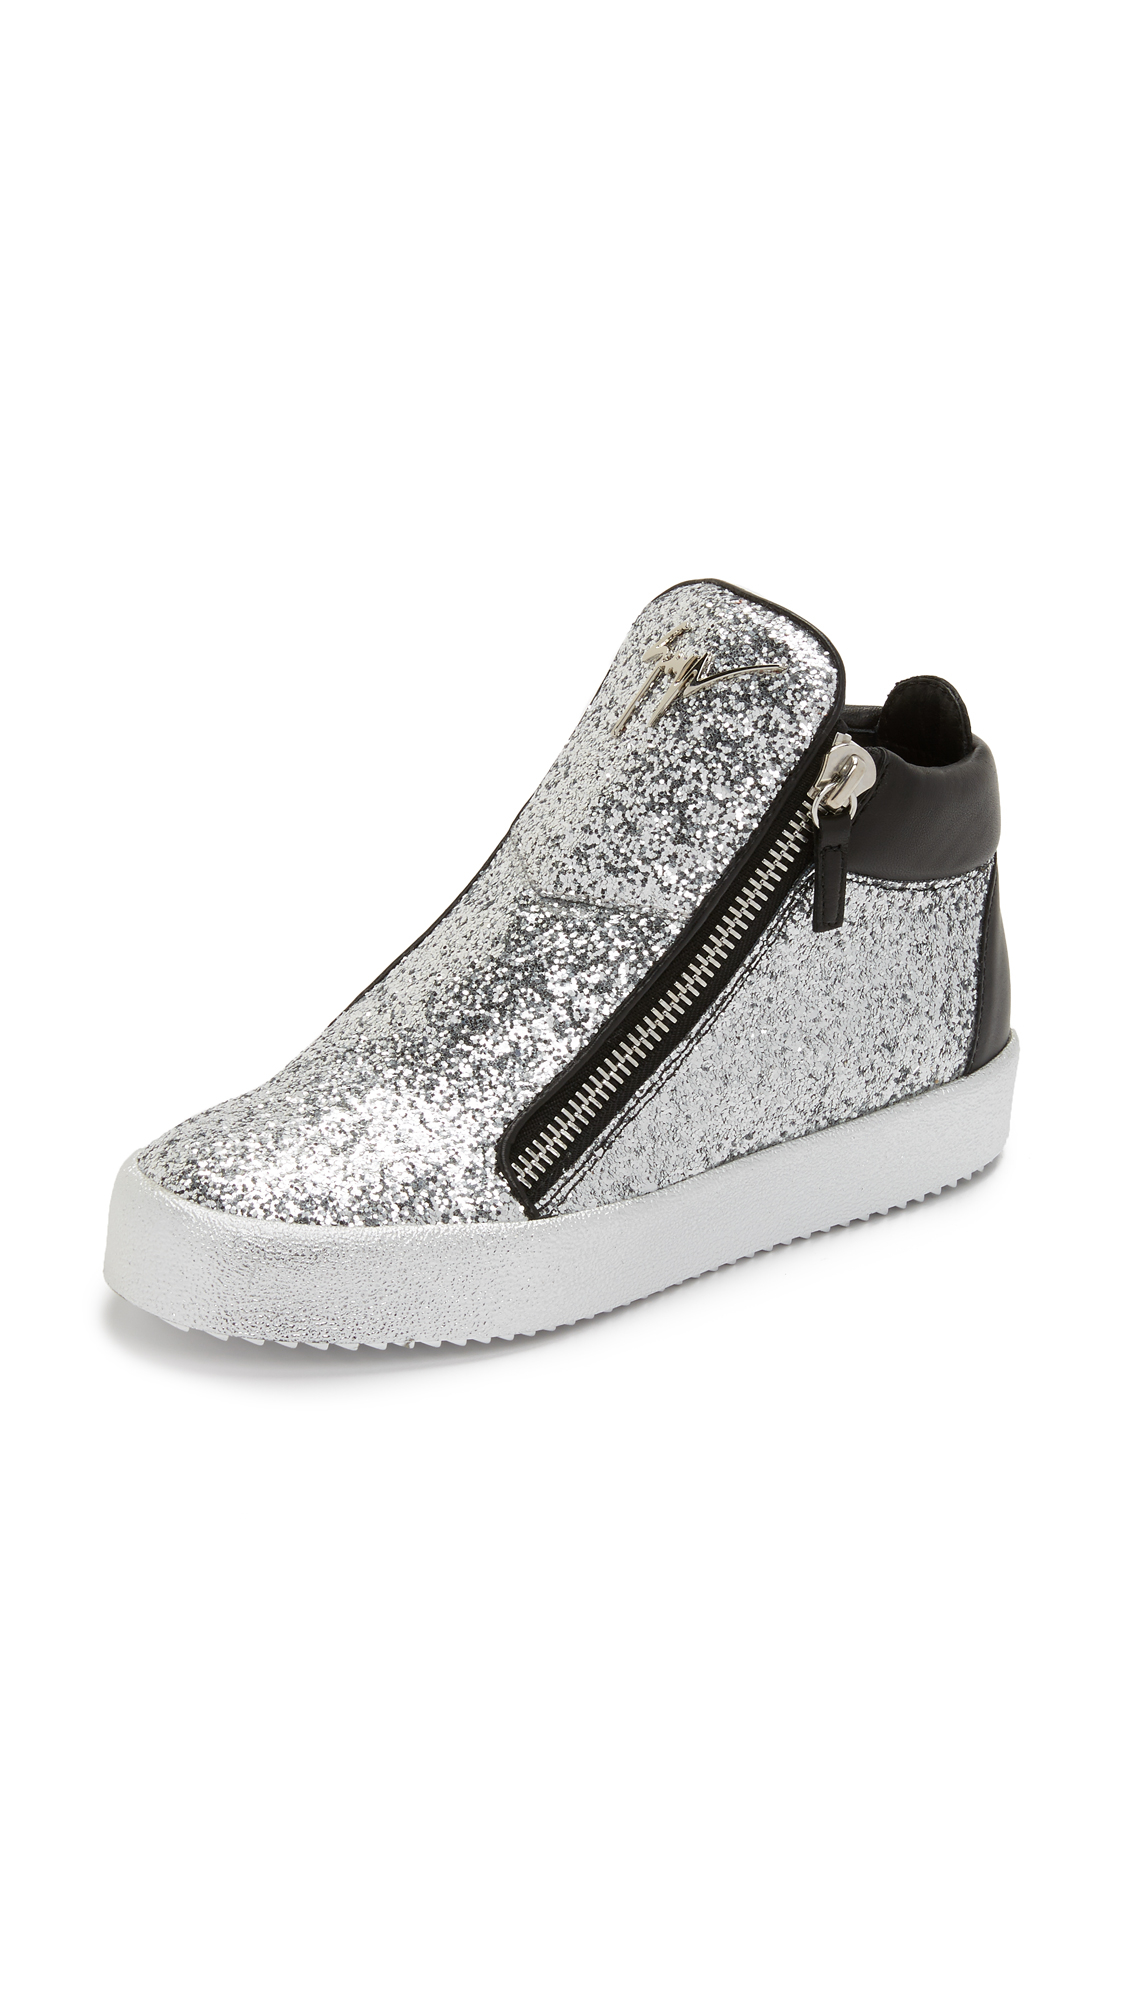 Giuseppe Zanotti Glitter Zip Sneakers (Women's) XRPvG